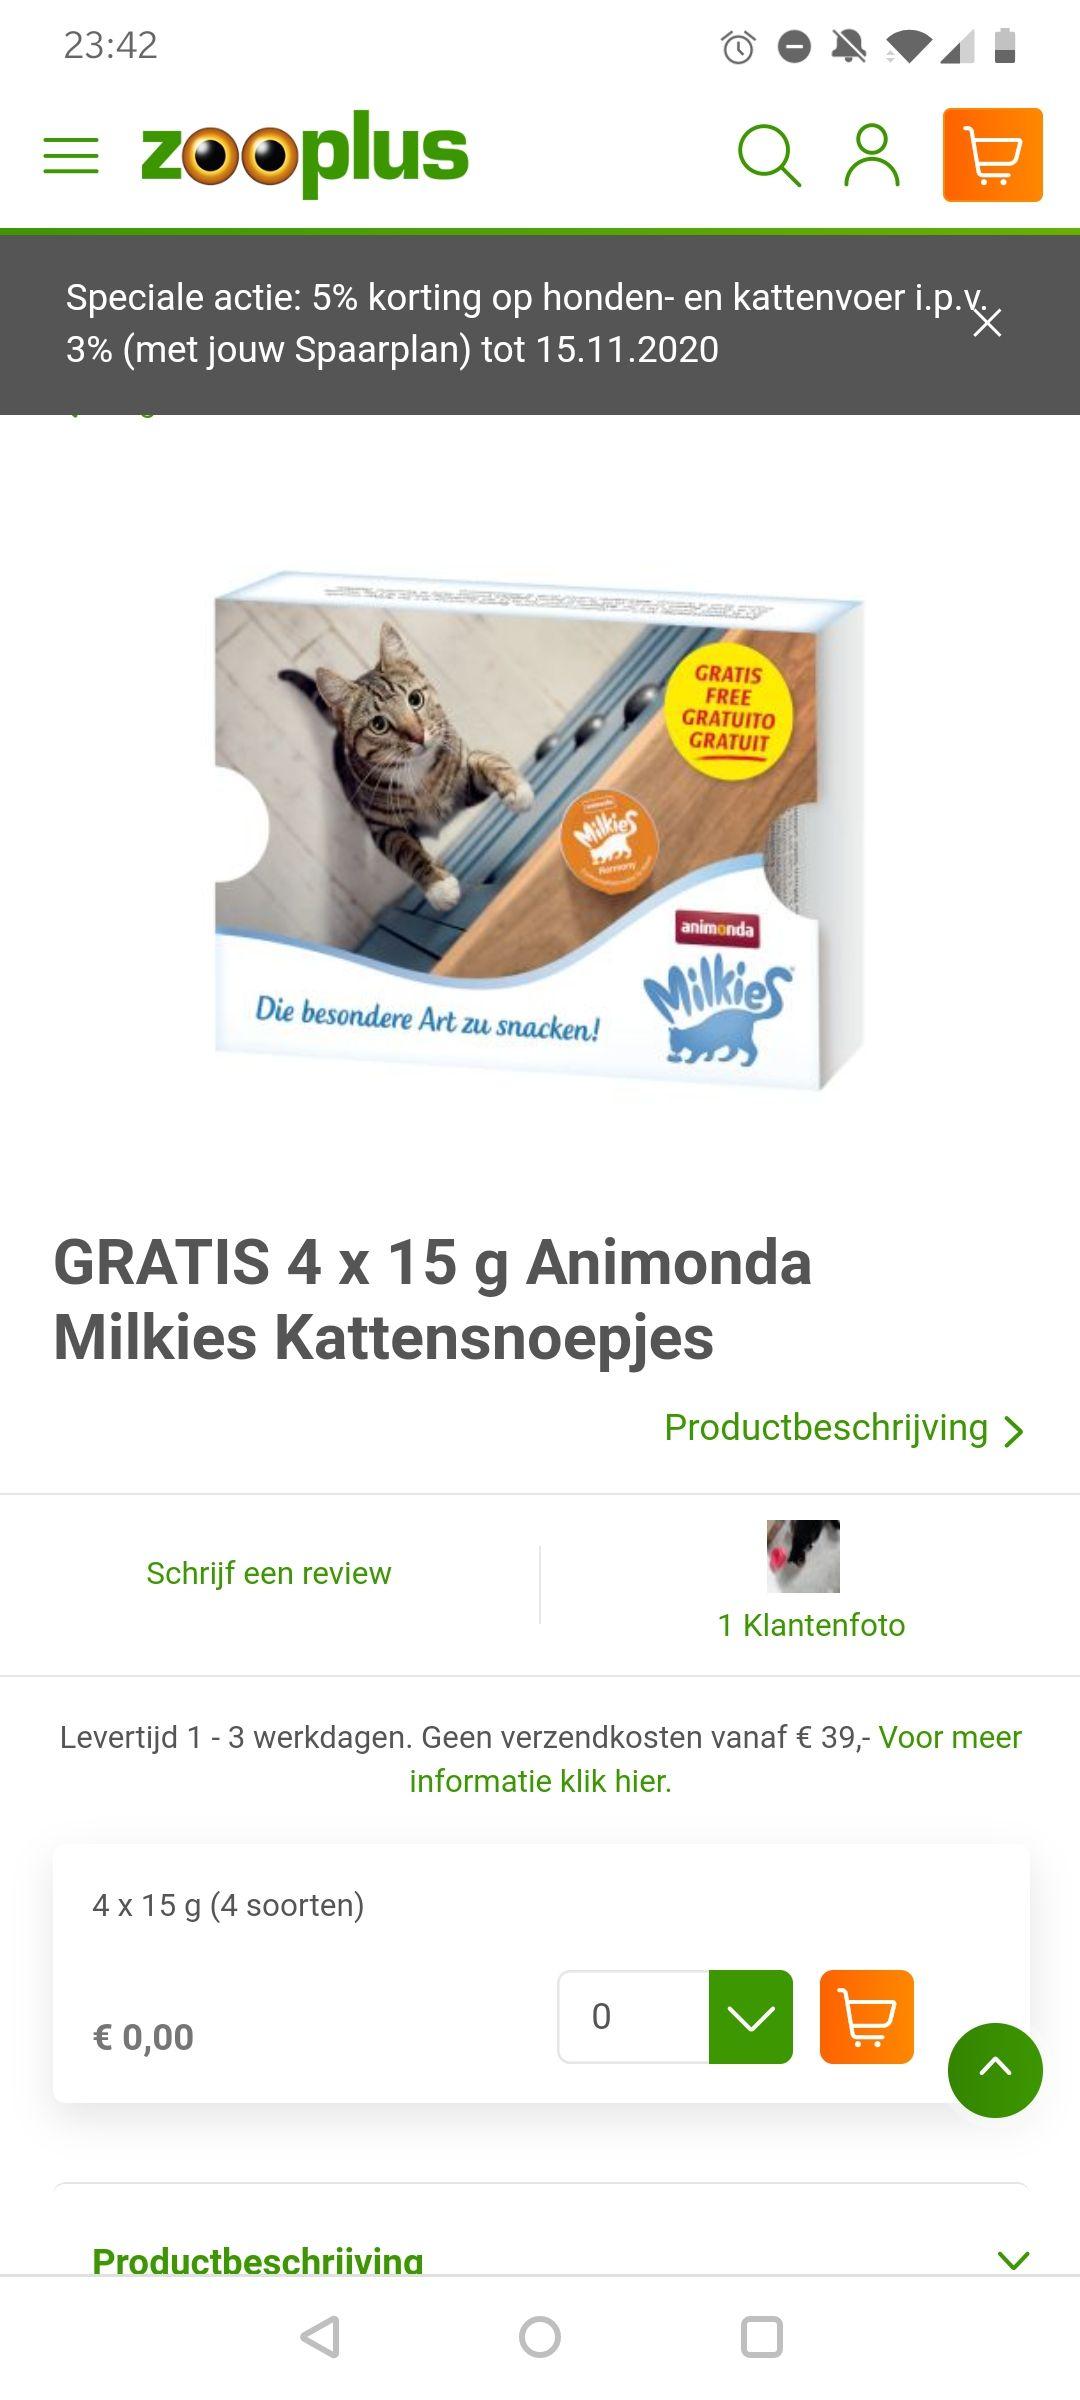 Gratis kattensnoepjes Animonda Milkies